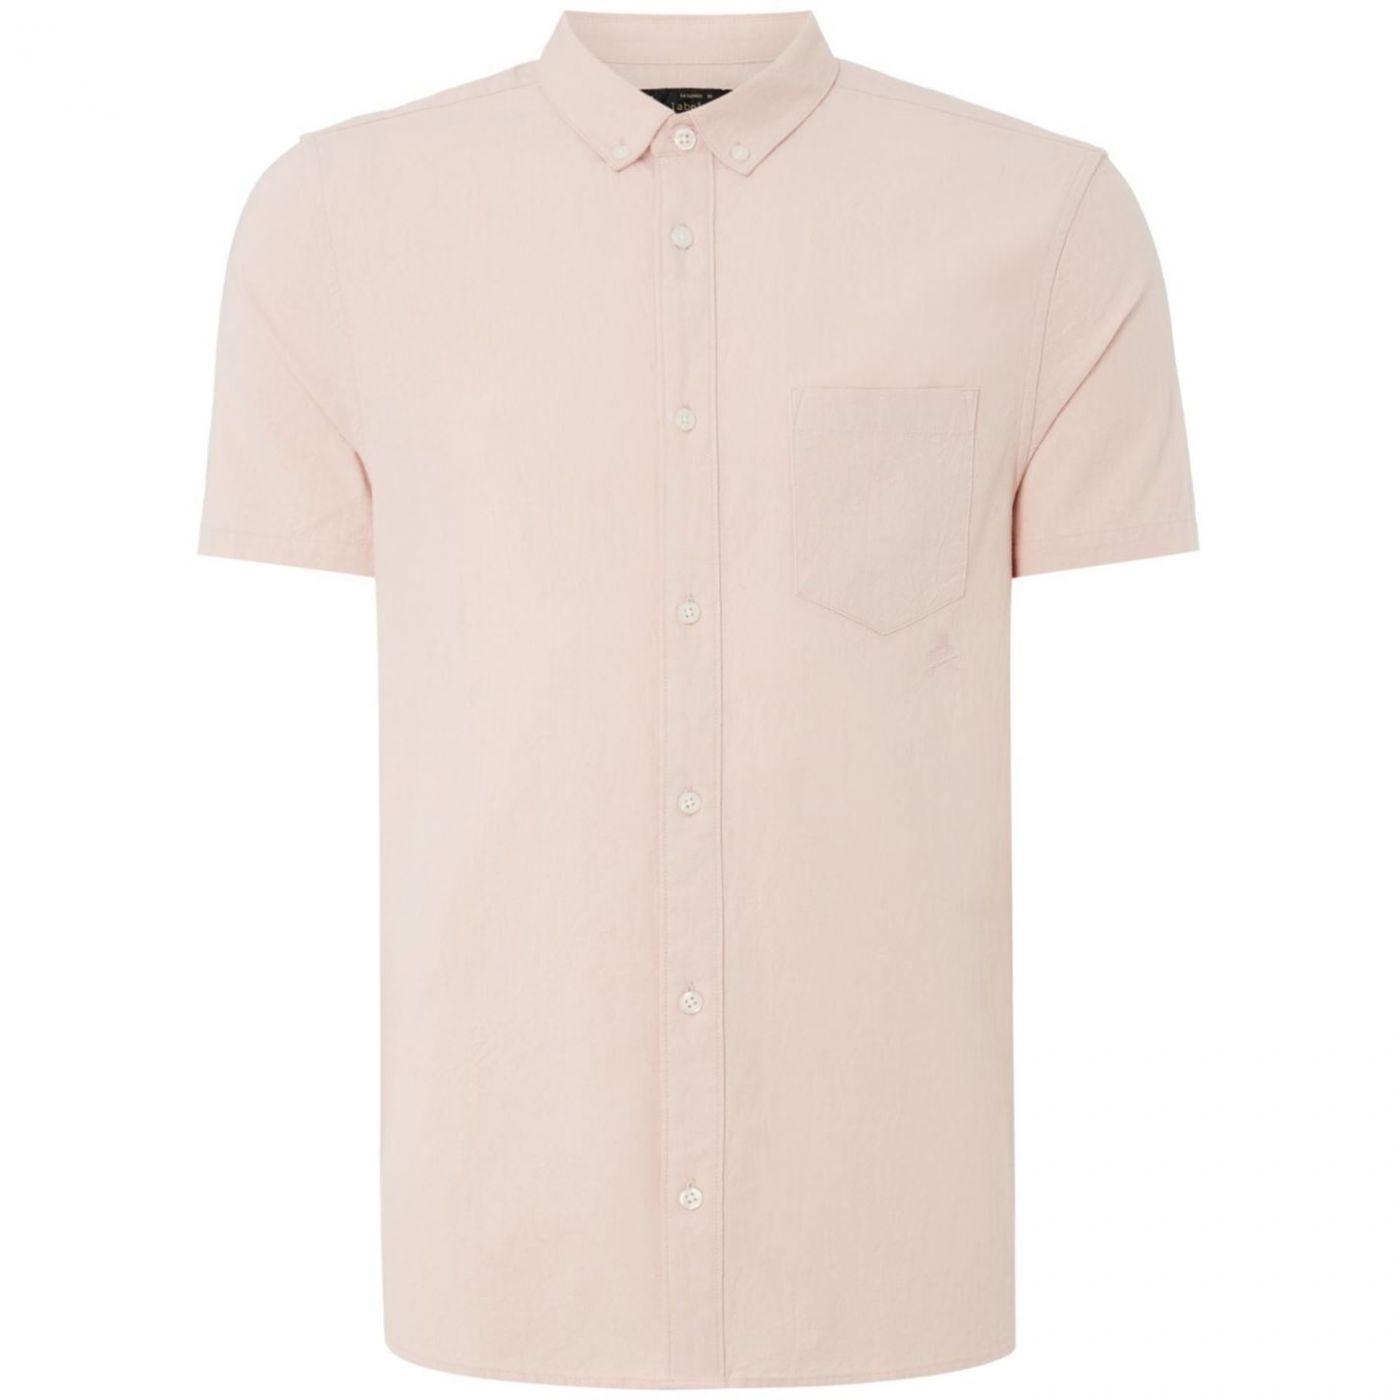 Label Lab Caden Crinkle Textured Short Sleeve Shirt